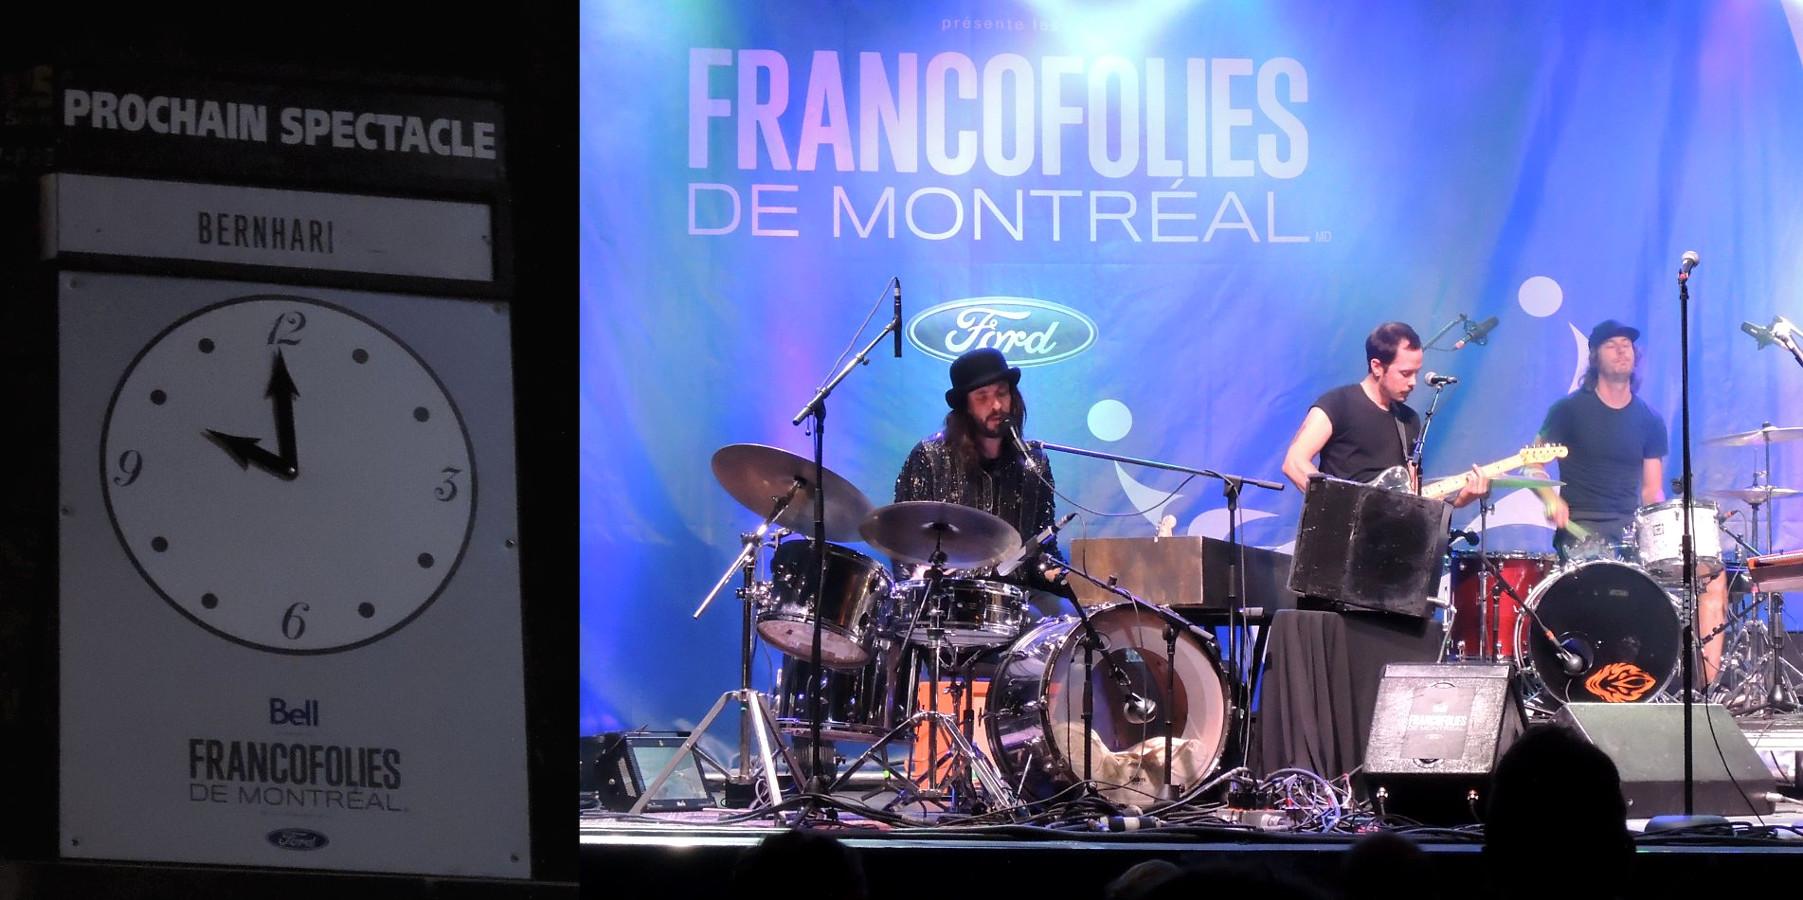 bernhari_20-6-15-francofolies-de-montreal-j-dummer